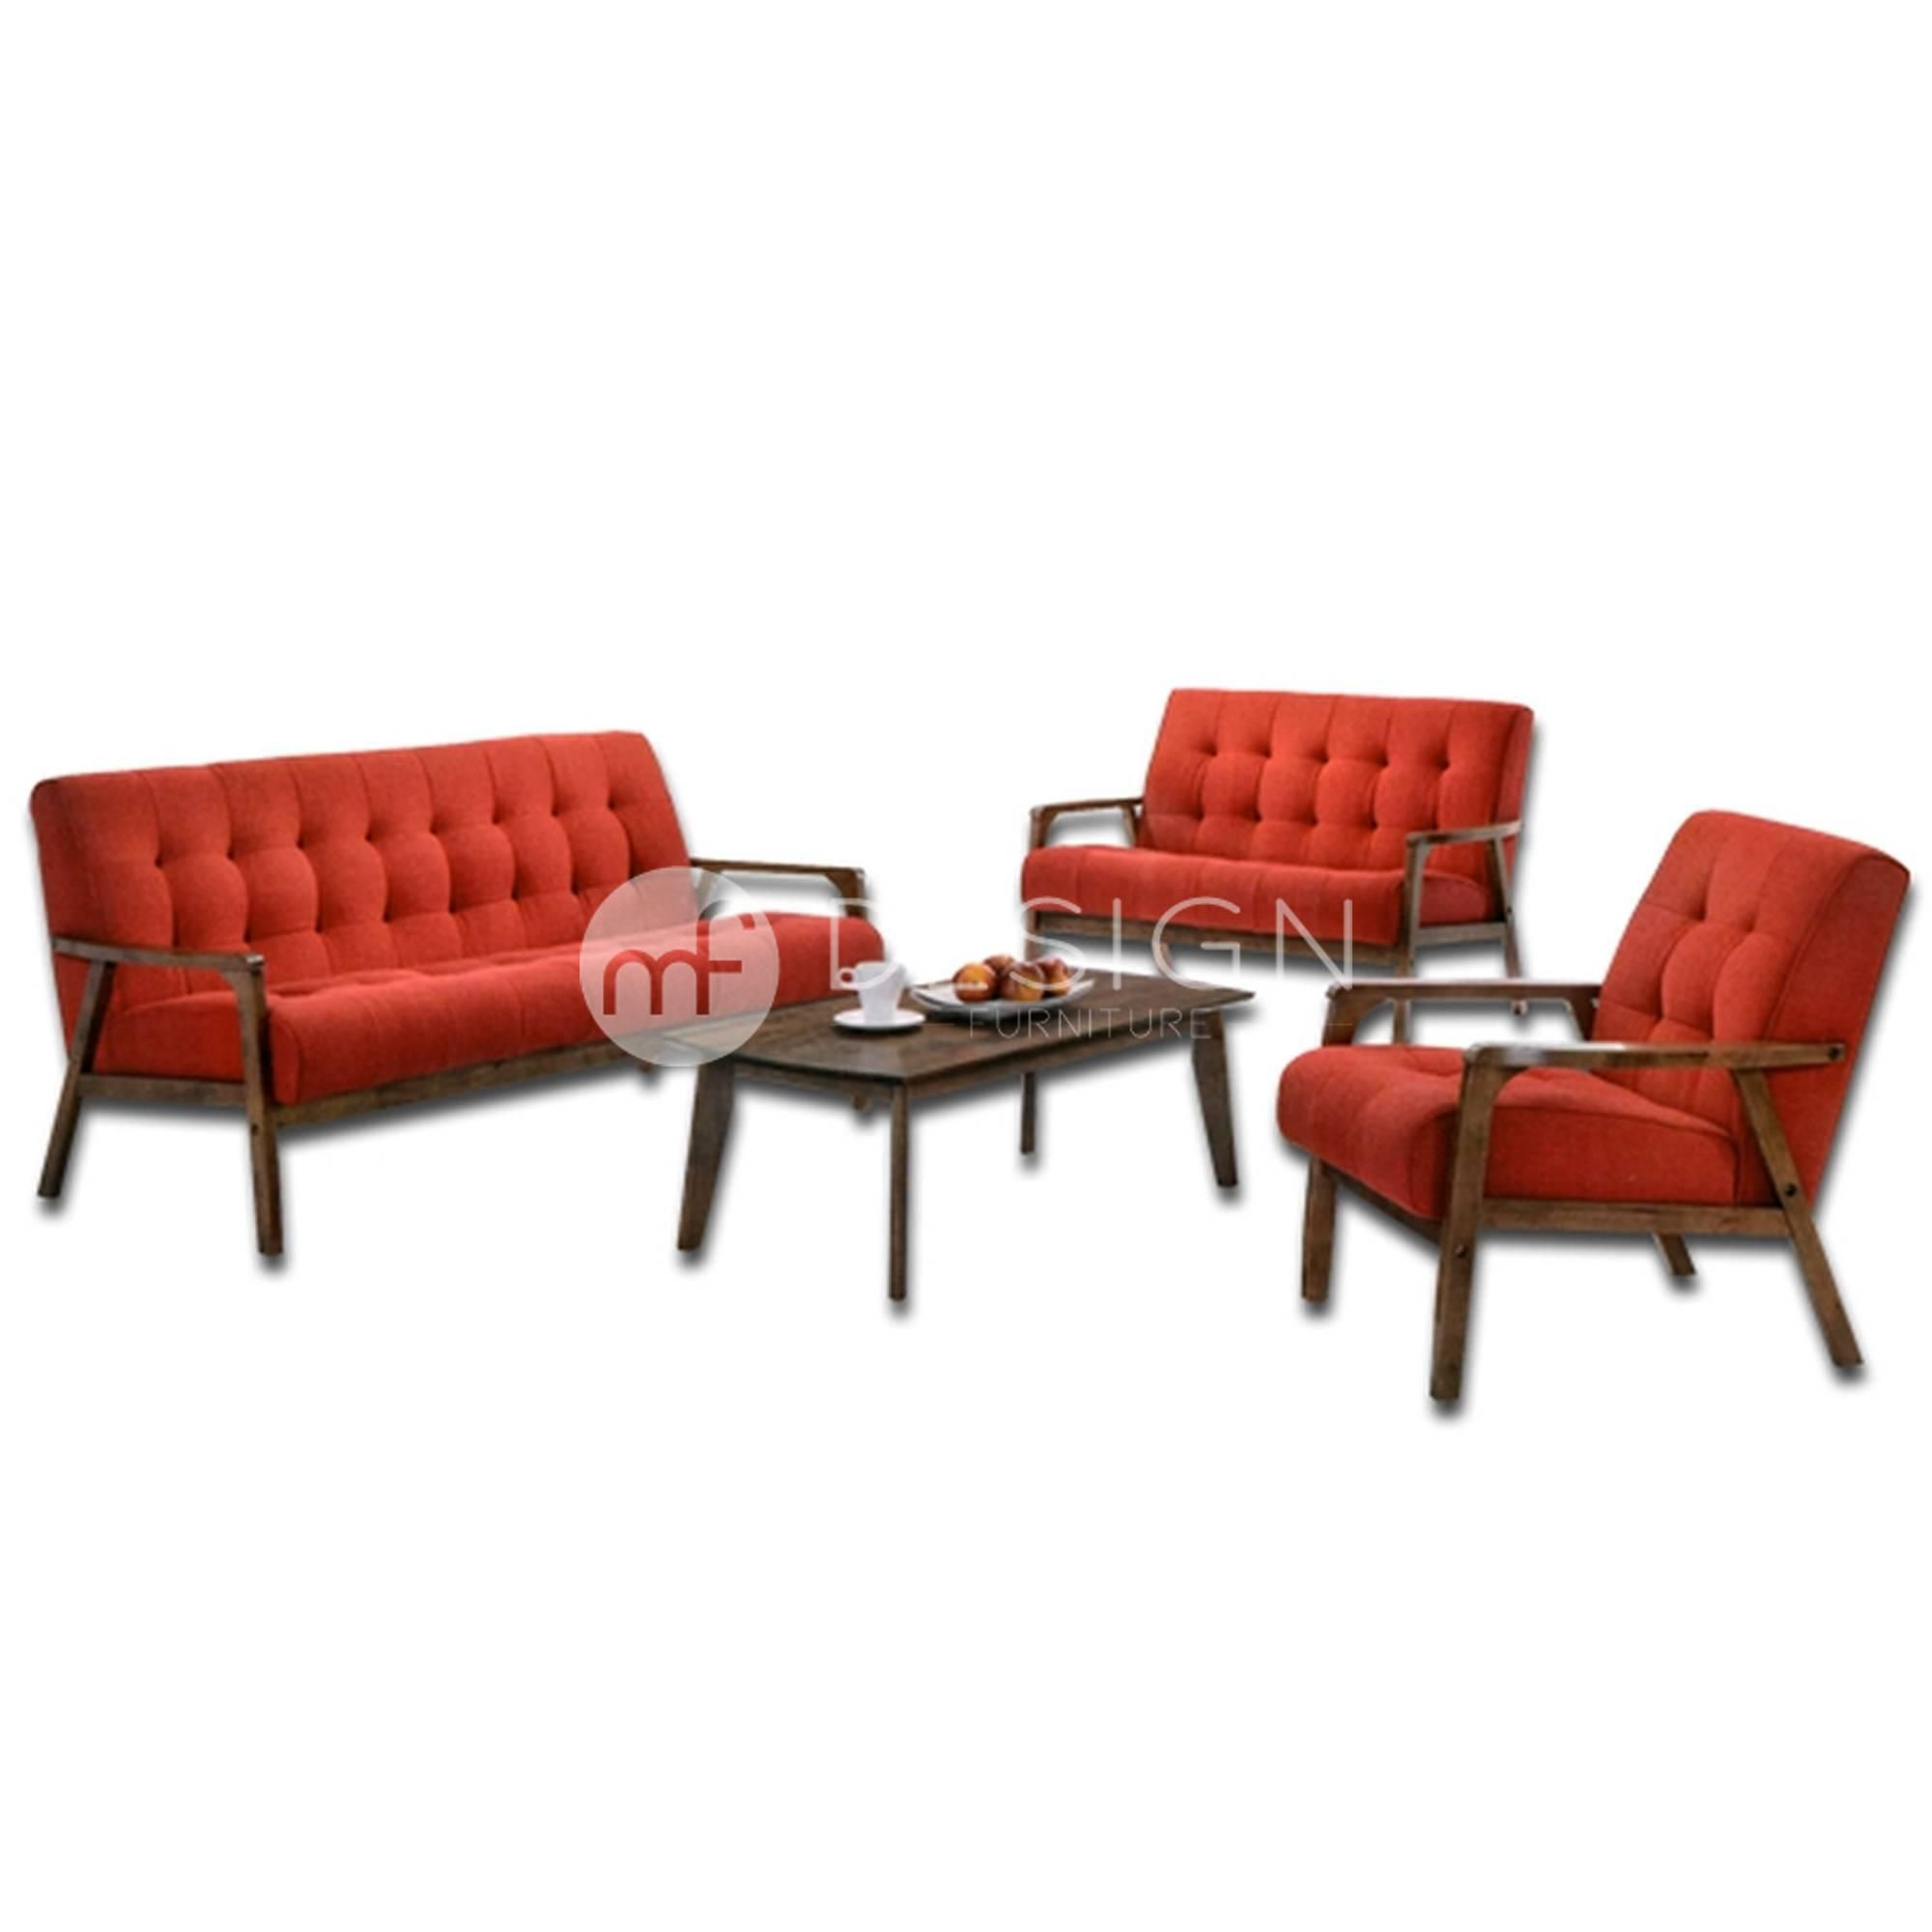 Nordic 1 2 3 Table Antique Sofa Set Red Mf Design Malaysian Favourite Design Furniture Wooden Arm Sofa Sofa Set